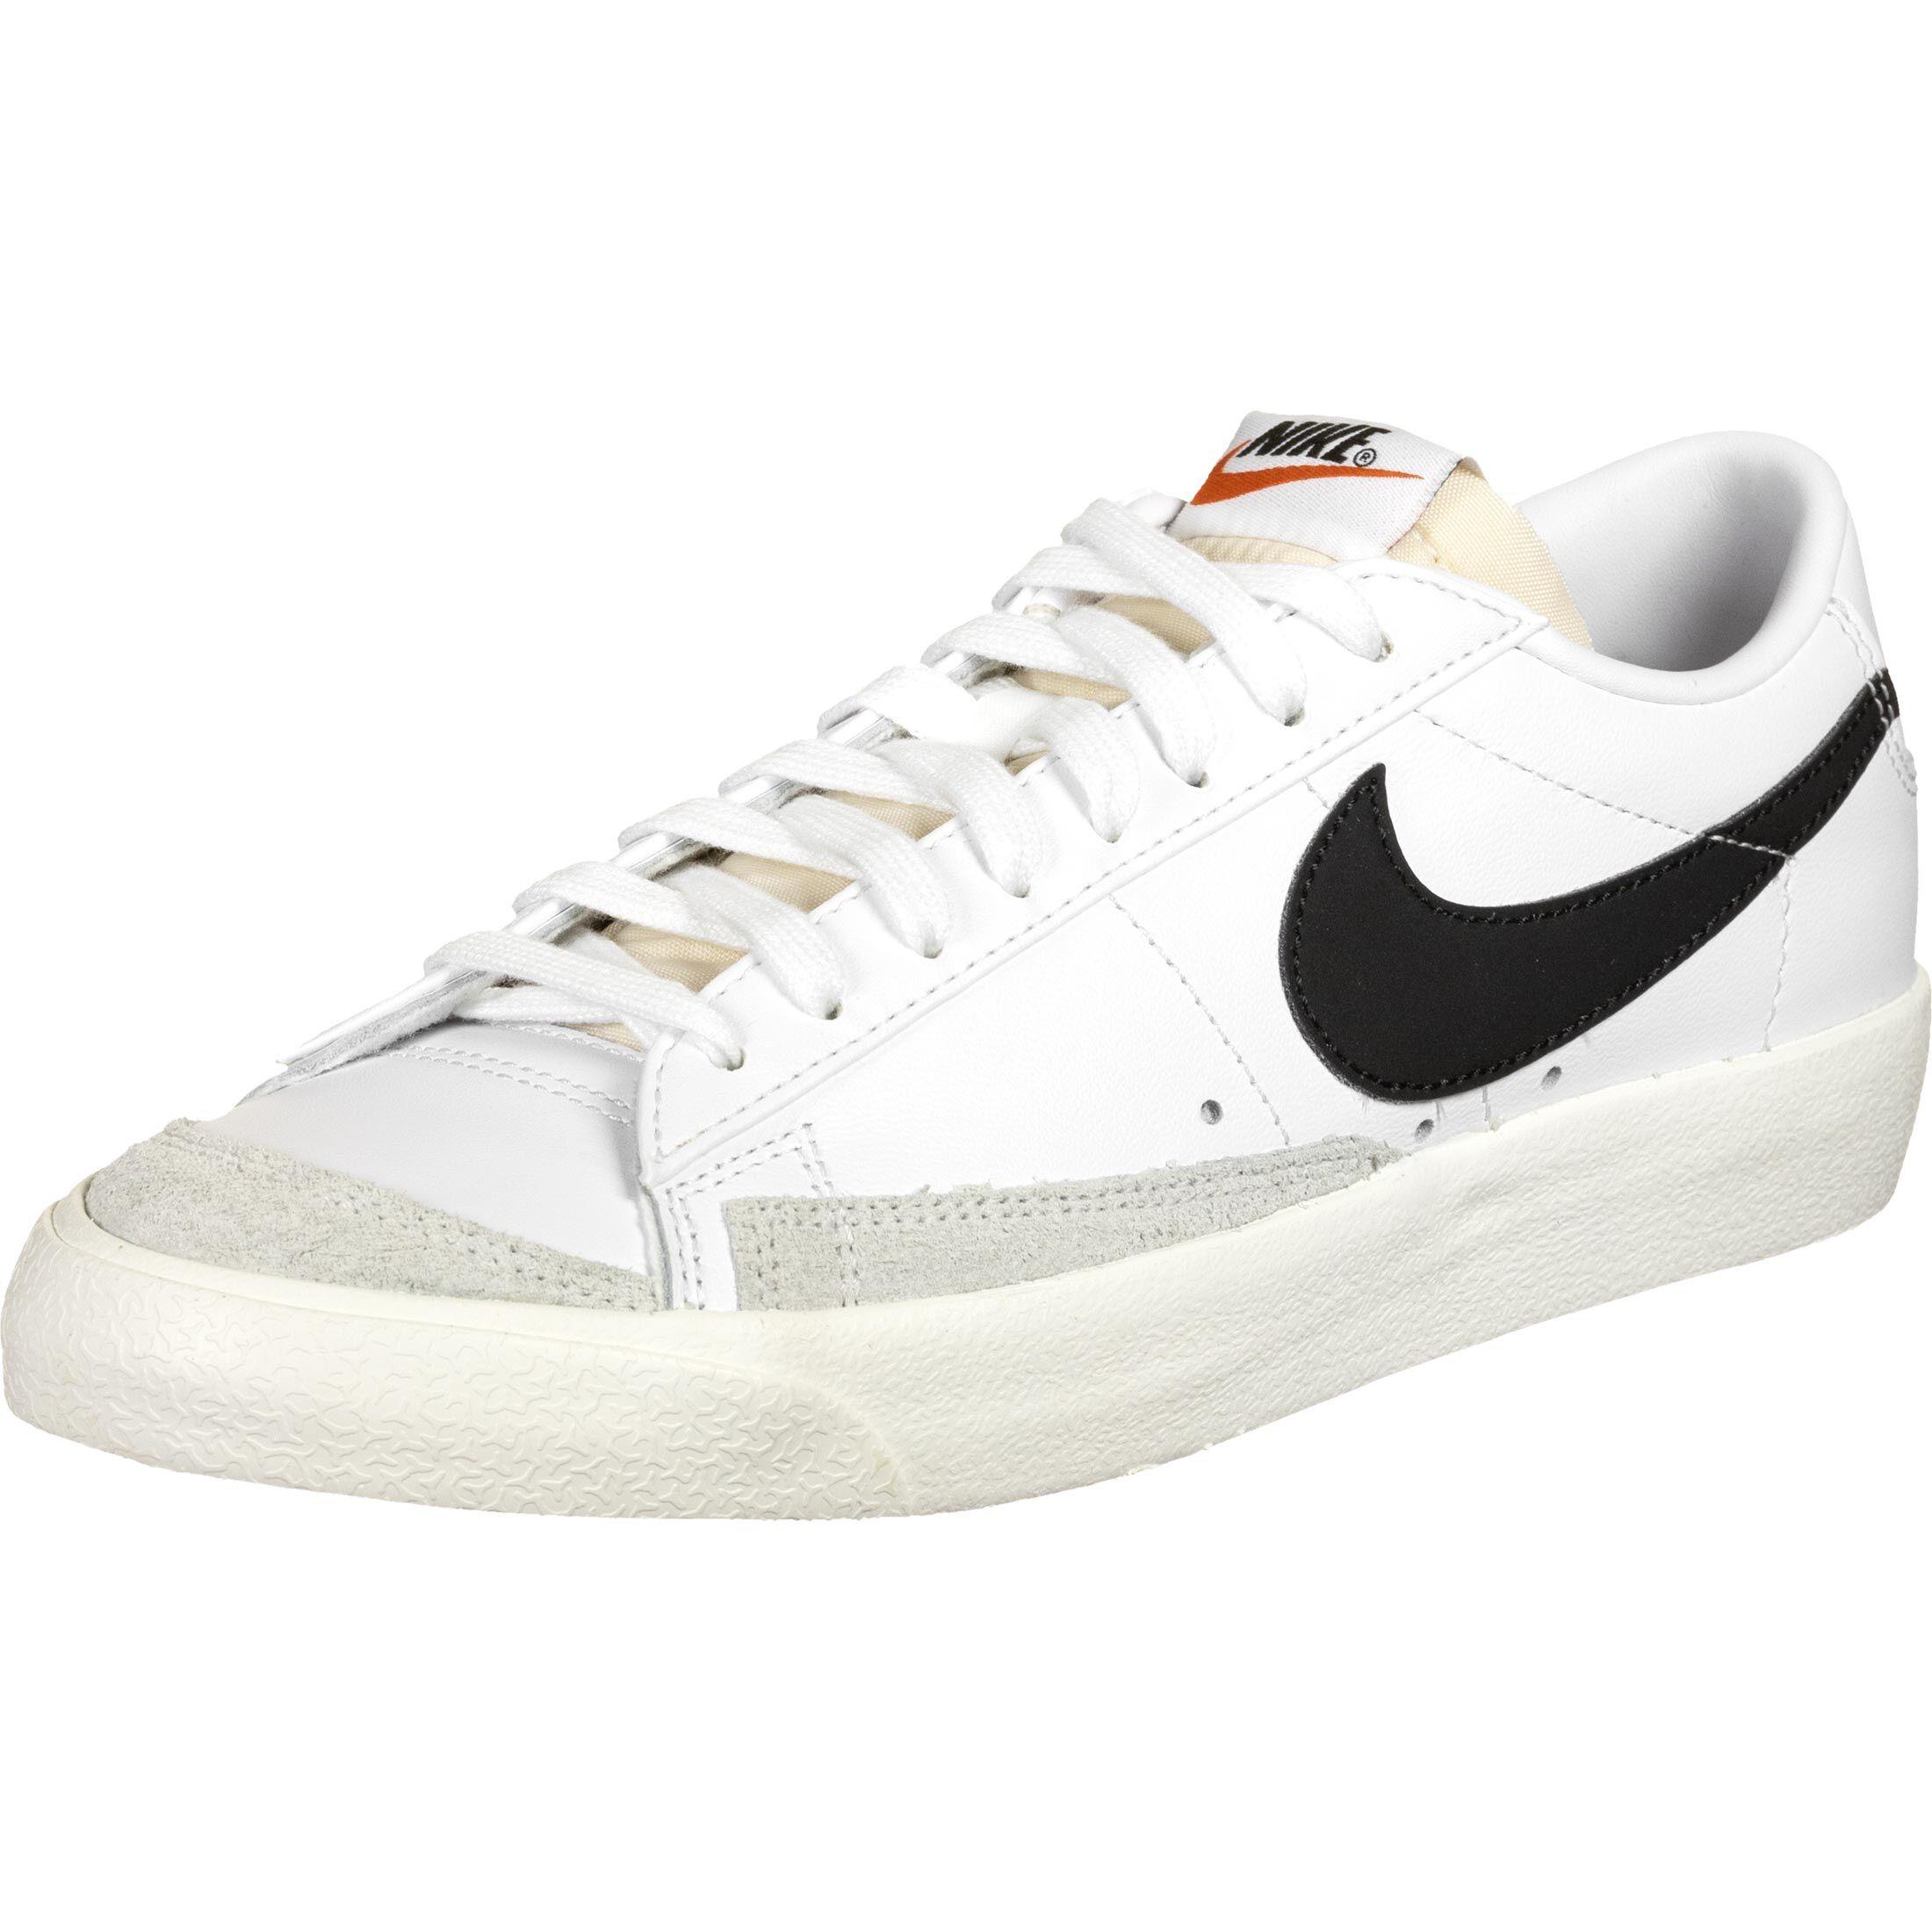 Nike Blazer Low 77 Vintage - Sneakers Low at Stylefile